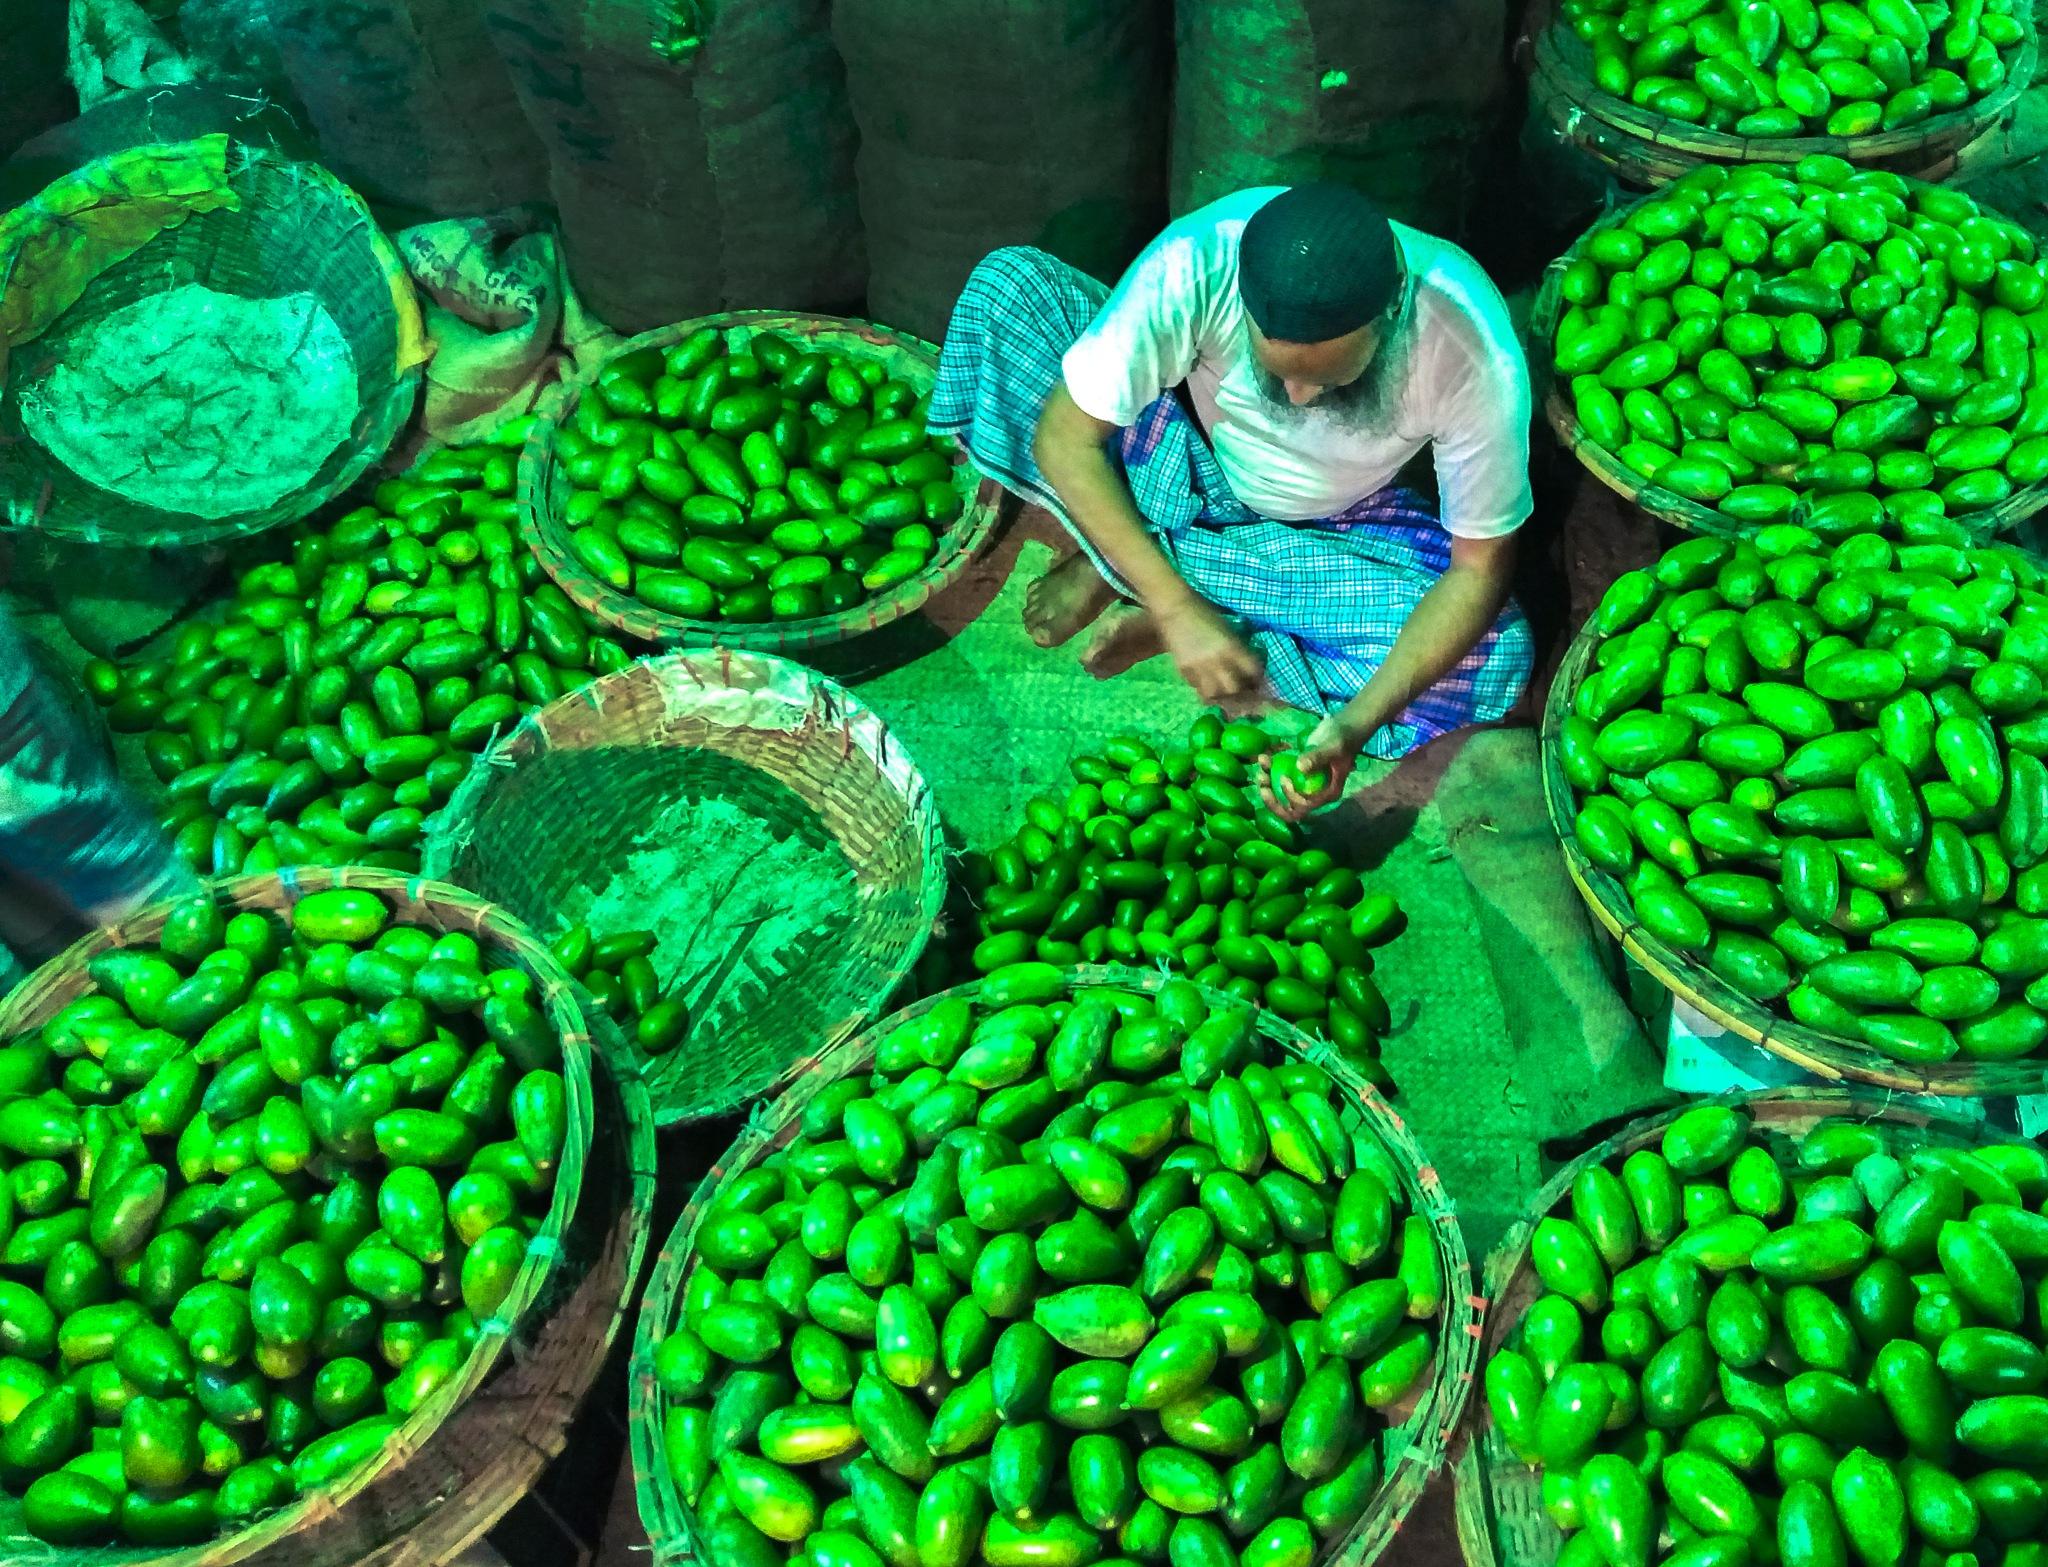 The lemon seller by Ehsanul Siddiq Aranya